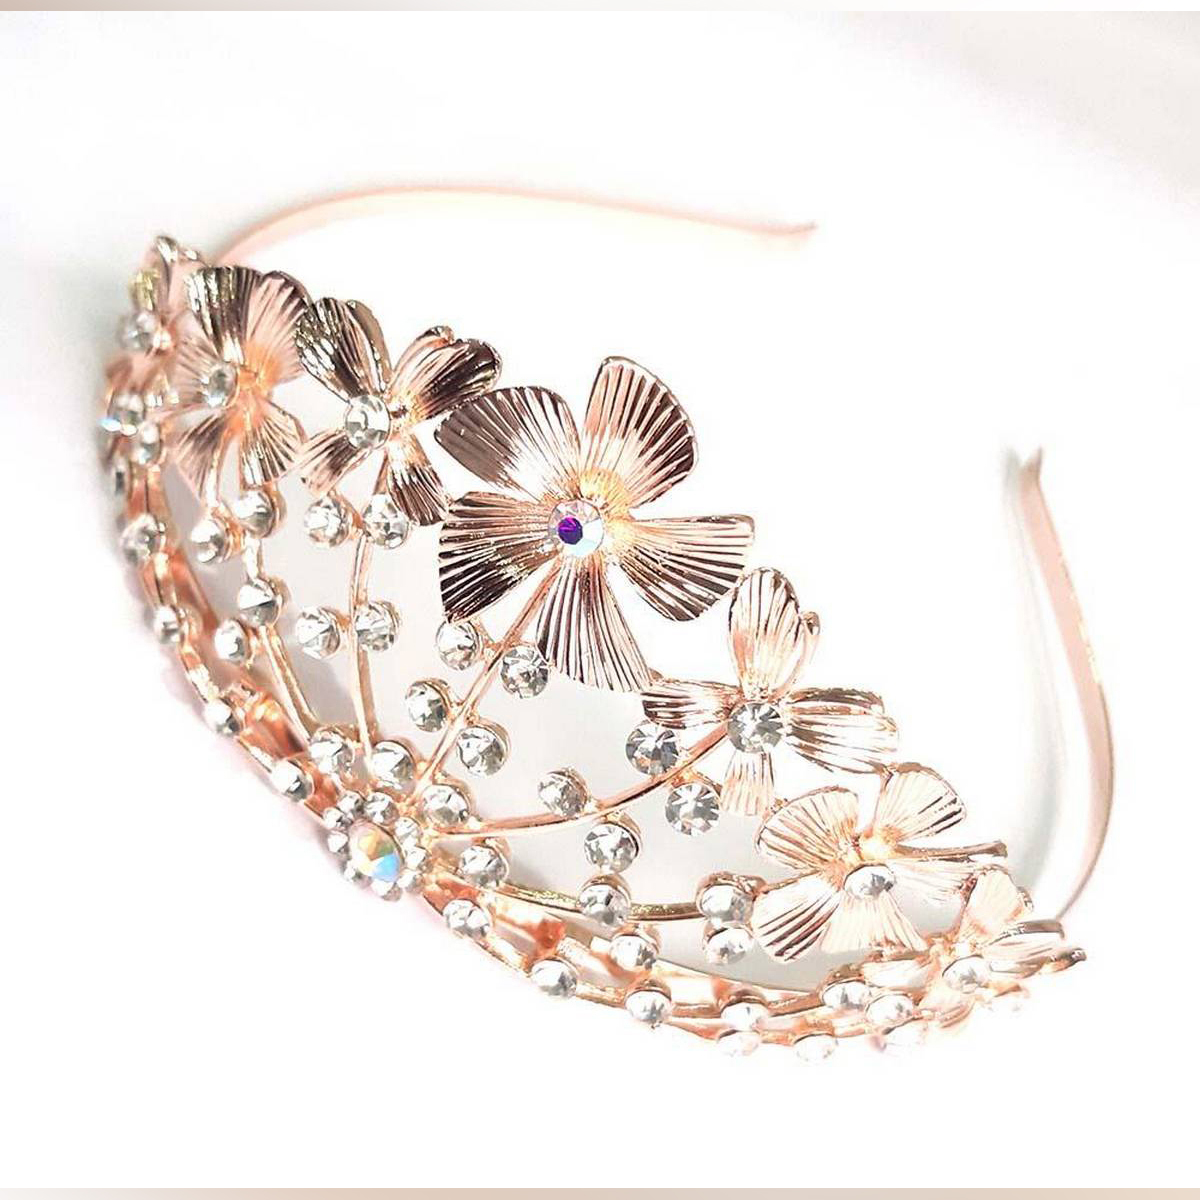 Crystal Wedding Tiara Women Bridal Hair Accessories Jewelry l Queen Headband Princess Hair Jewelry